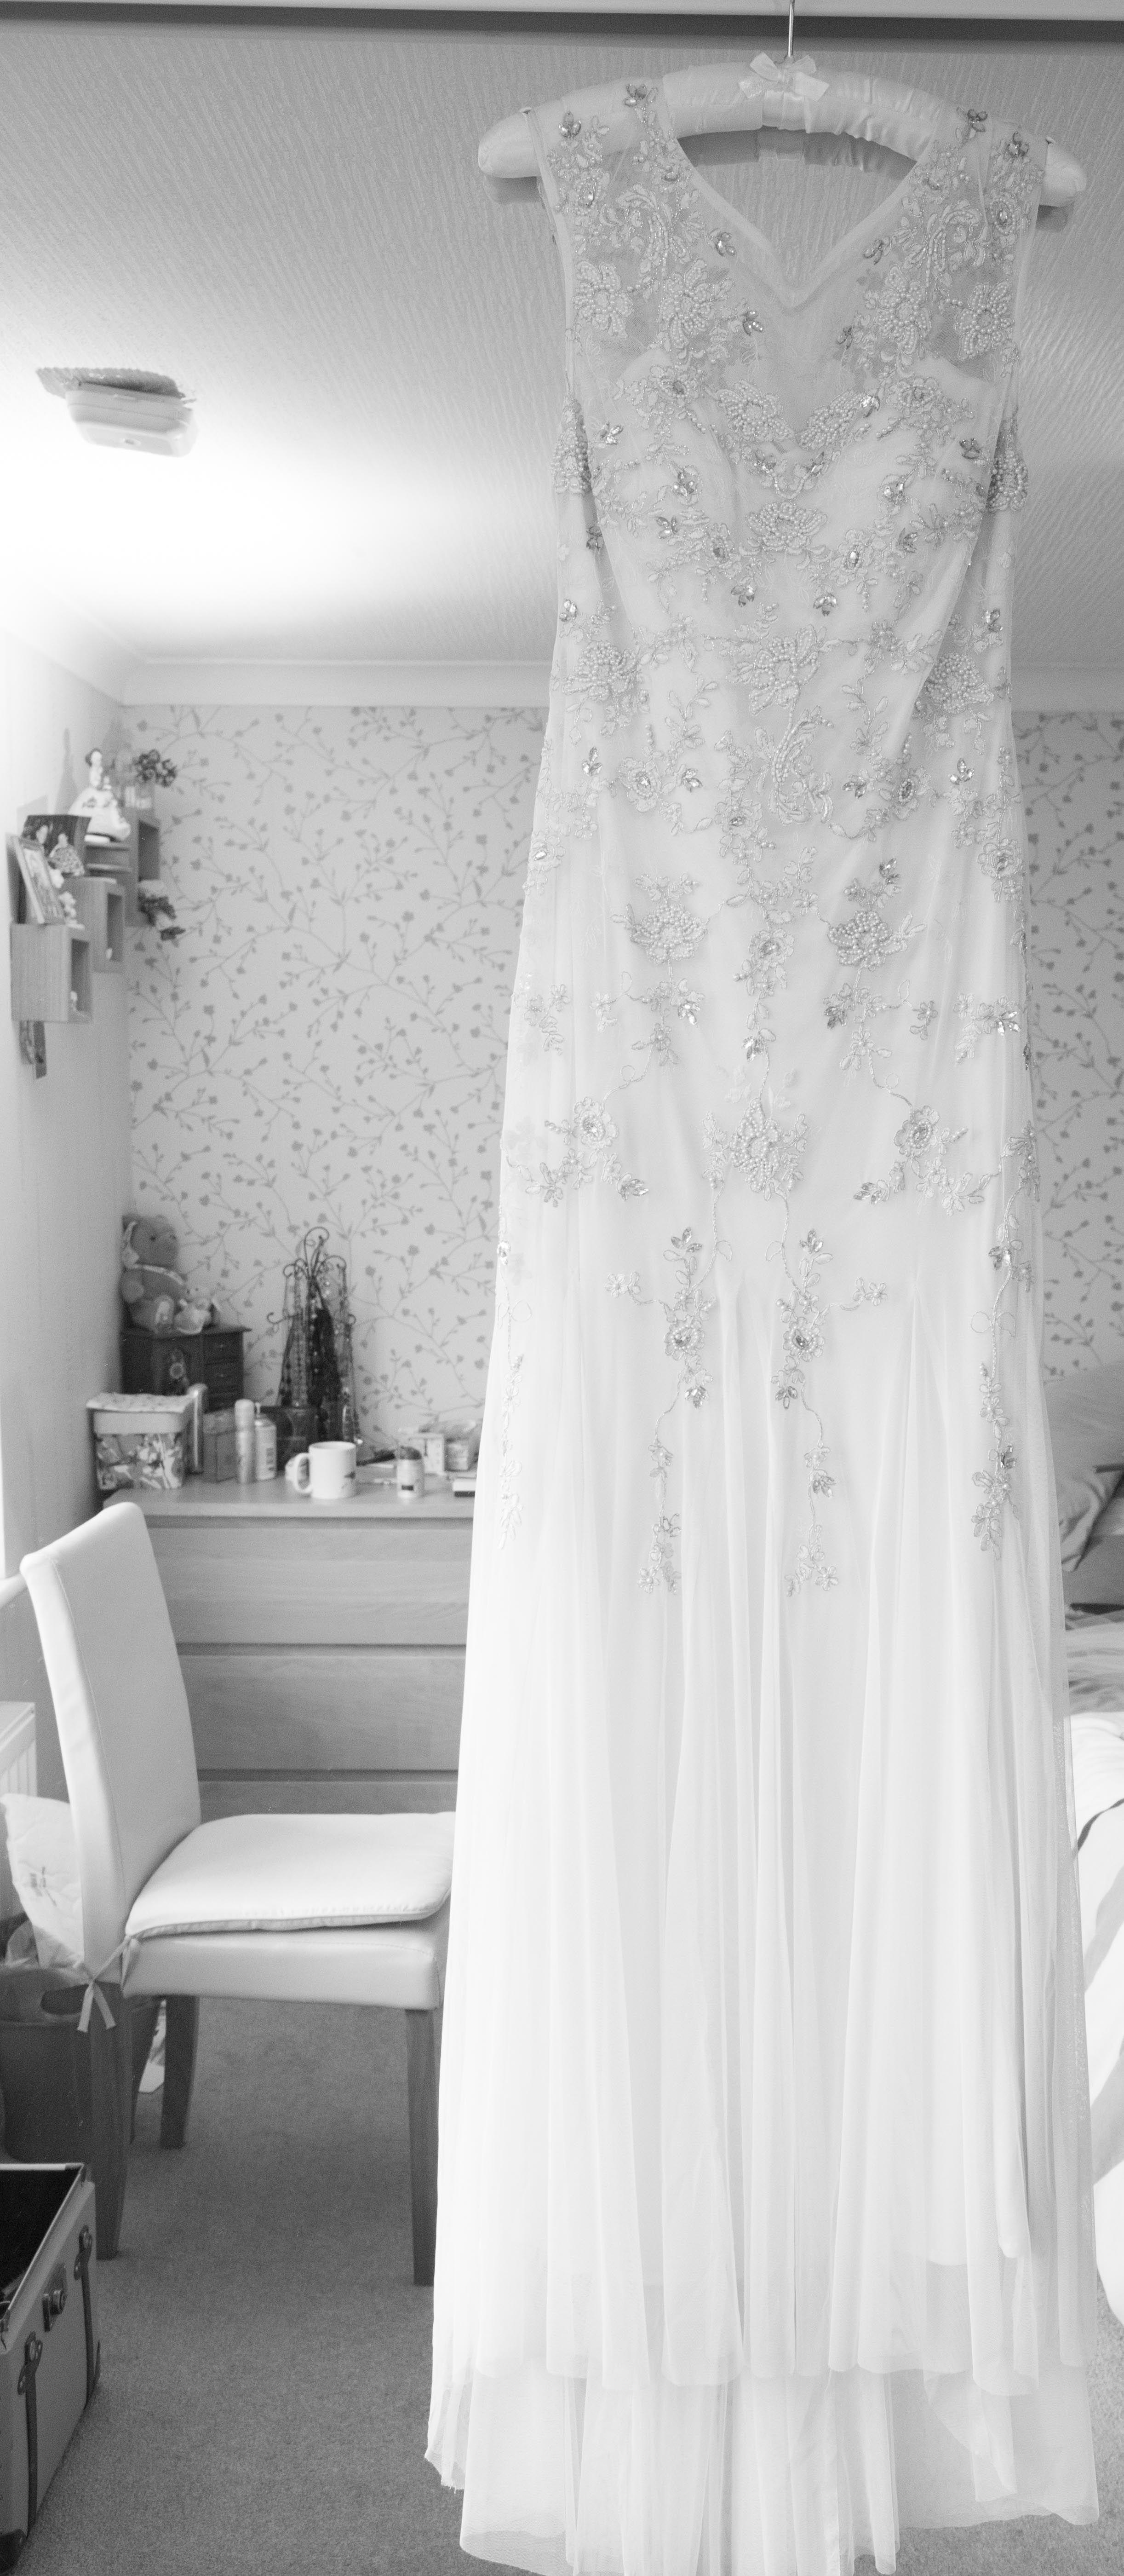 Amy's wedding dress  Adam u Amyus Maidstone Wedding at Oakwood House  Lawless Rose